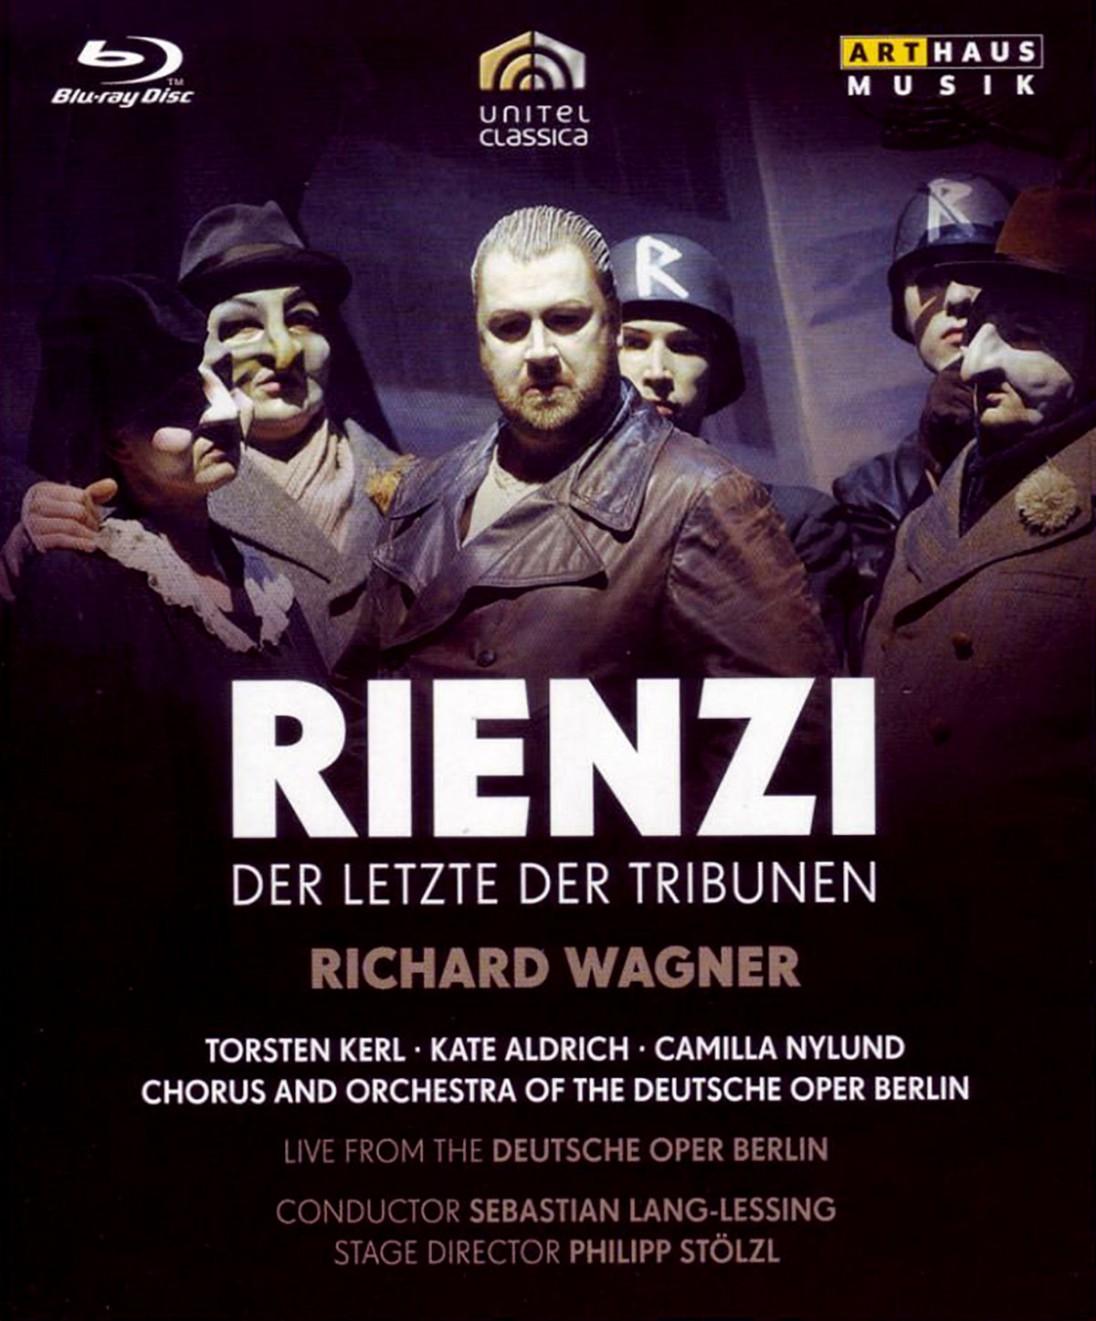 Richard_Wagner_Rienzi_Der_Letzte_der_Tribunen_Lang-Lessing